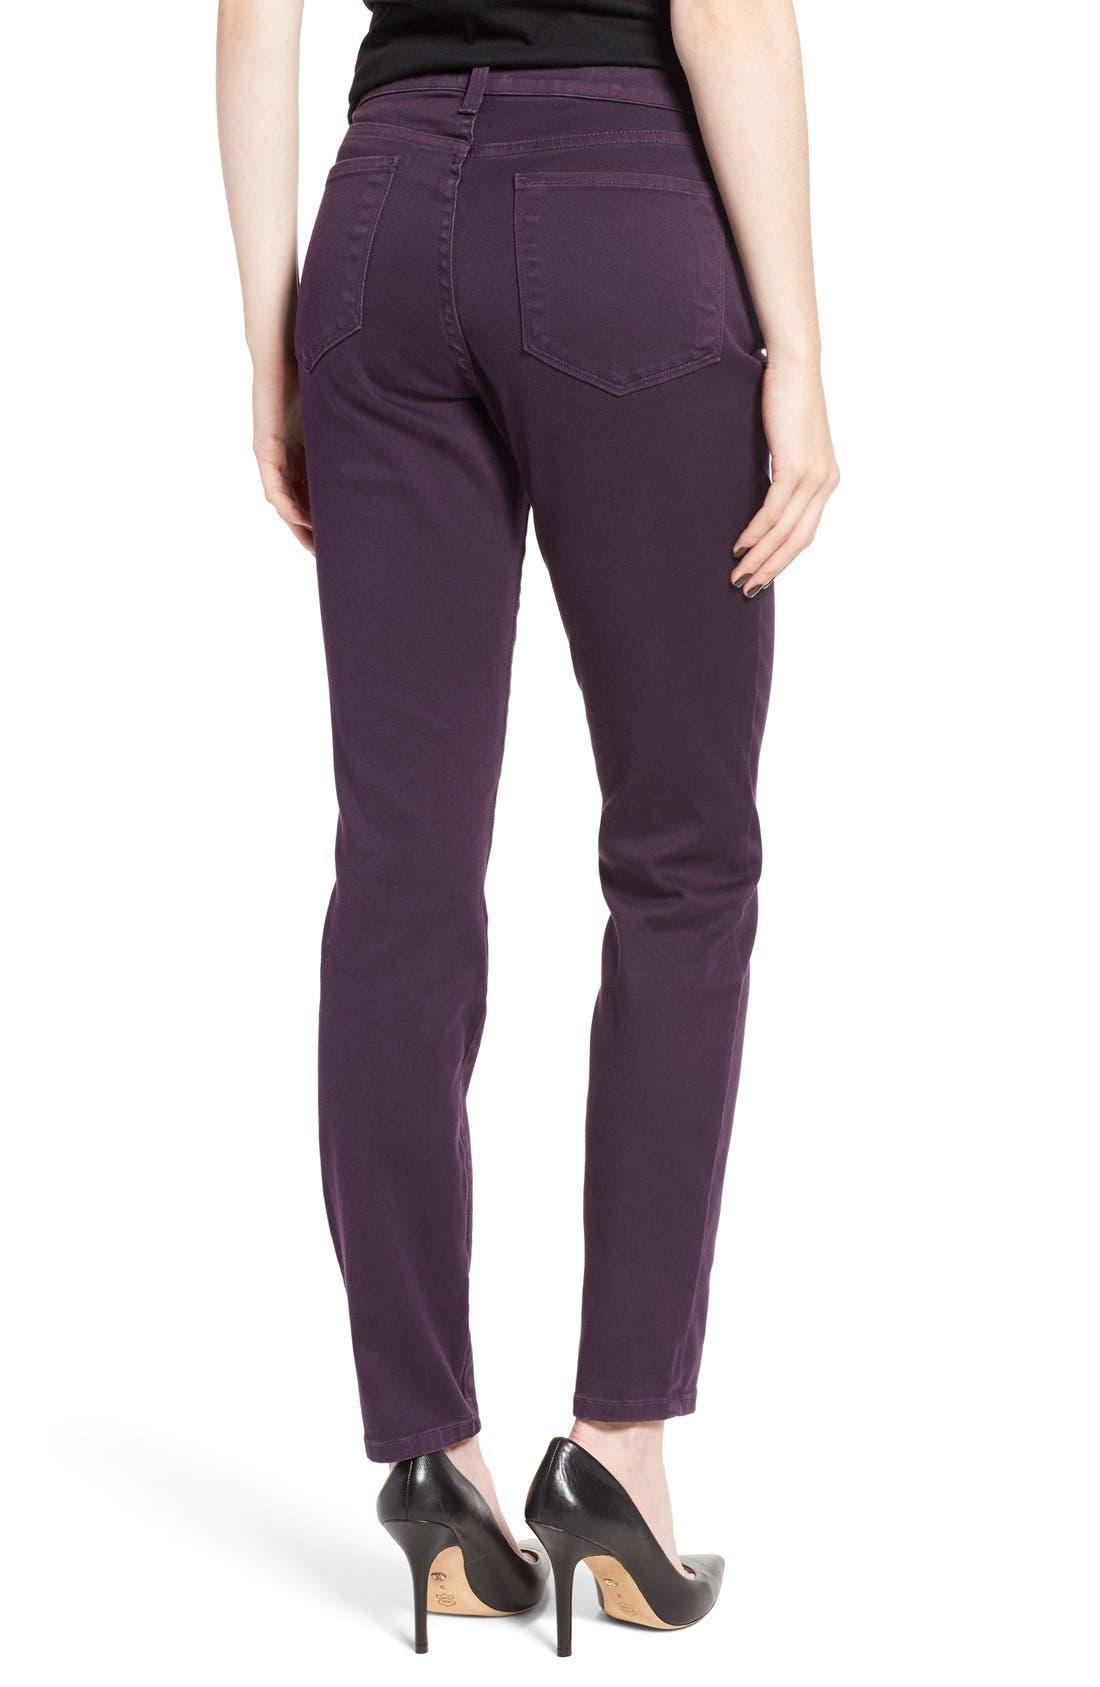 Alternate Image 2  - NYDJ Alina Colored Stretch Skinny Jeans (Regular & Petite)